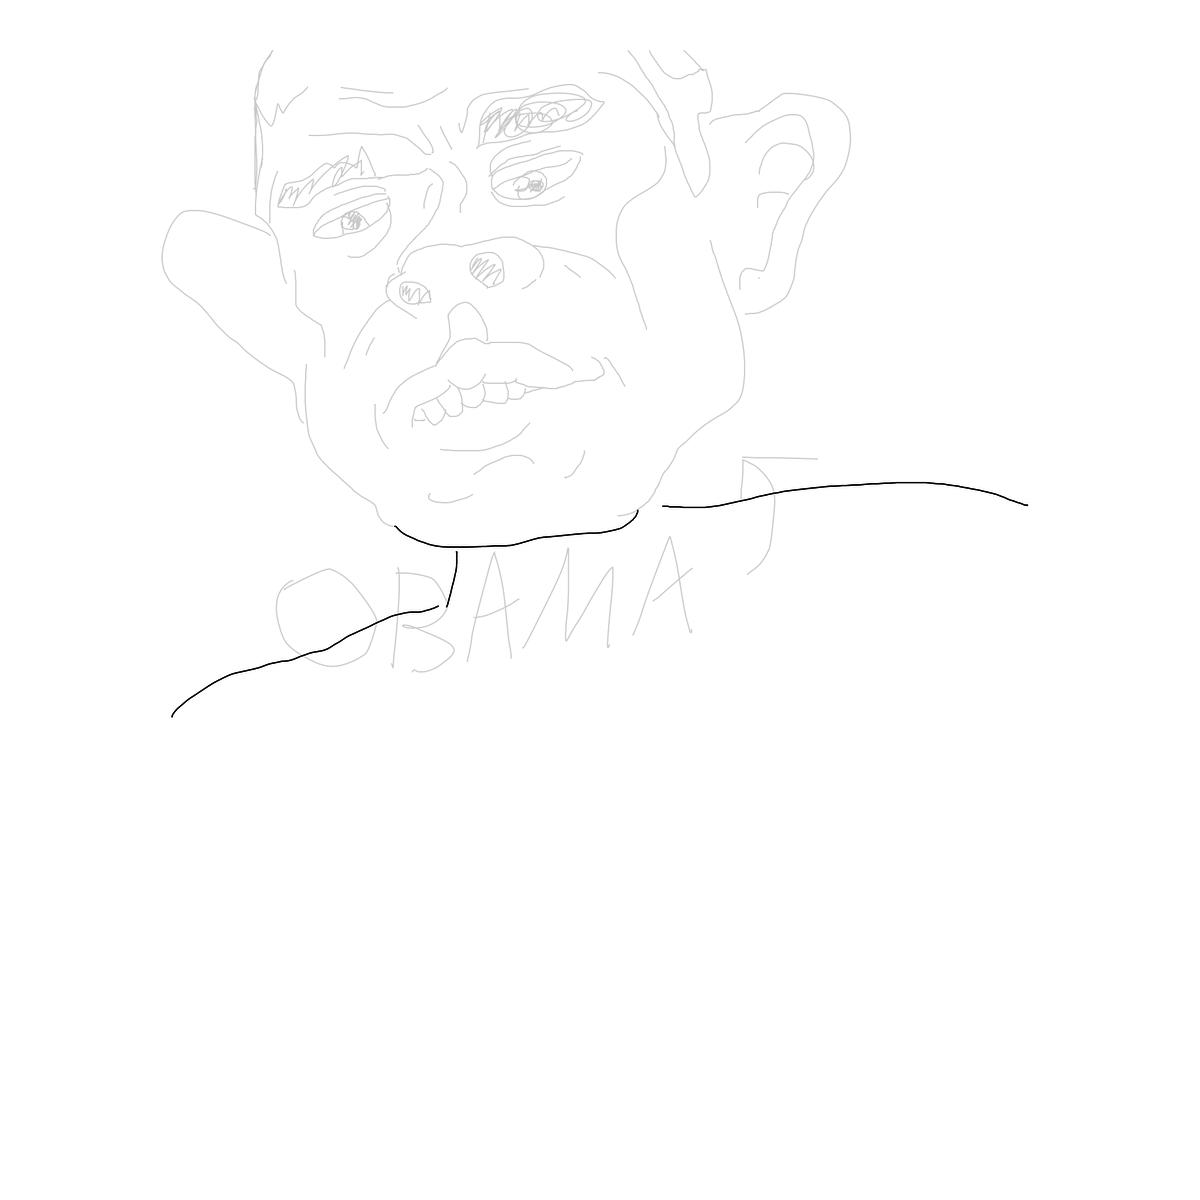 BAAAM drawing#9623 lat:52.4749145507812500lng: 13.4068460464477540